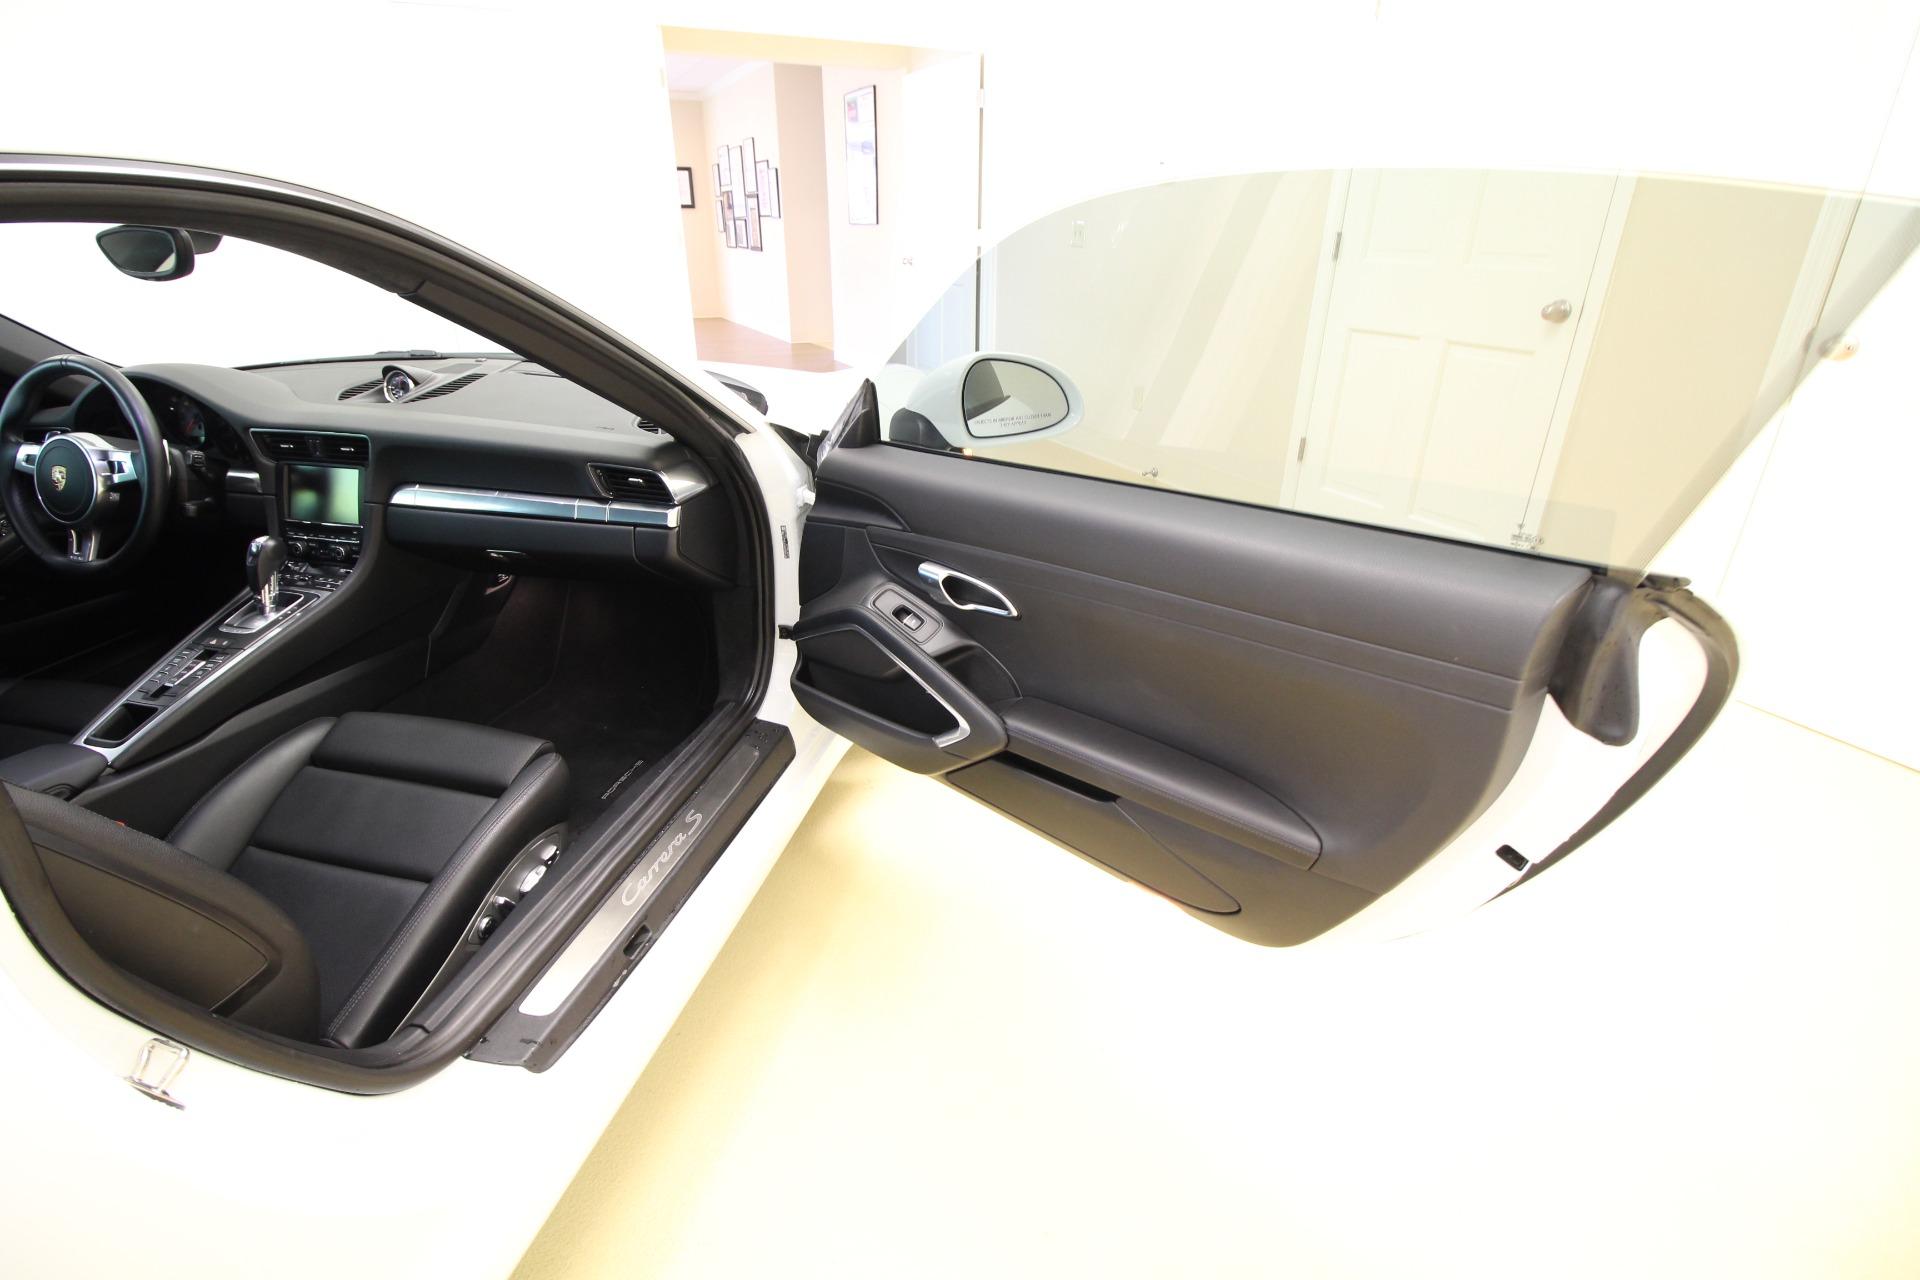 Used 2014 Porsche 911 Carrera S Coupe SUPERB CONDITION LOCAL TRADE | Albany, NY